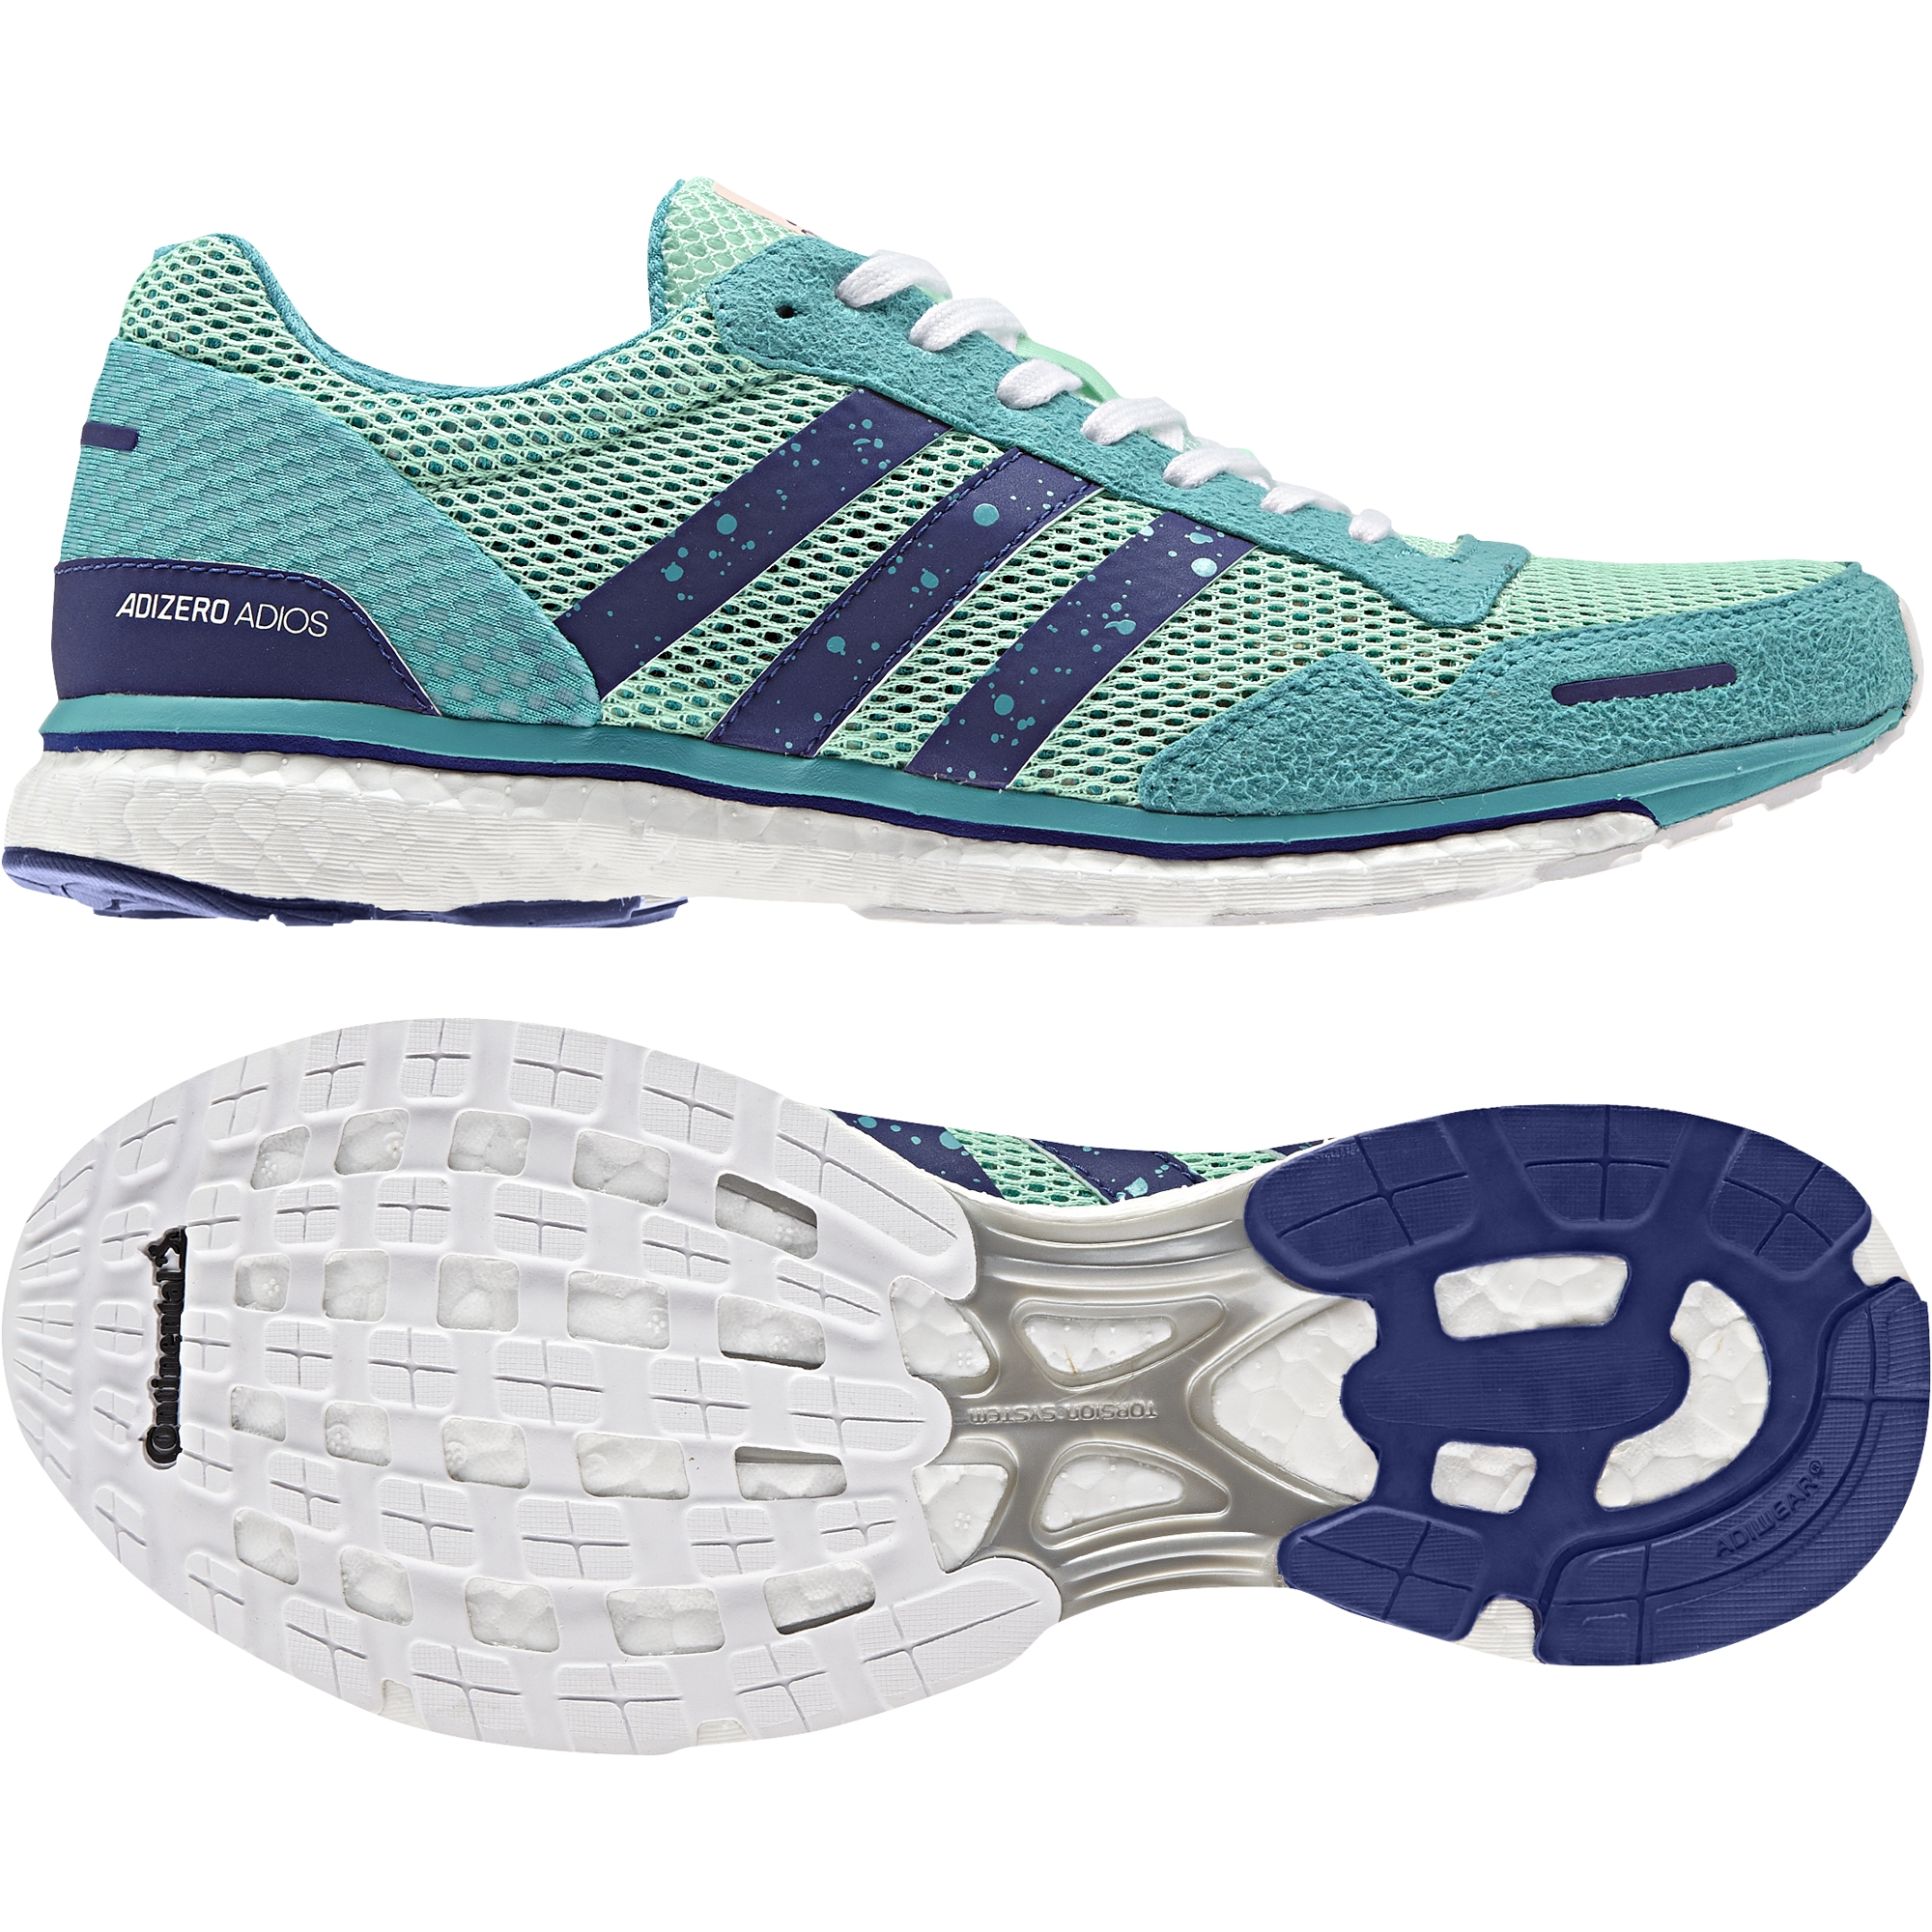 best website 3221b d72ba Chaussures femme adidas Adizero Adios 3